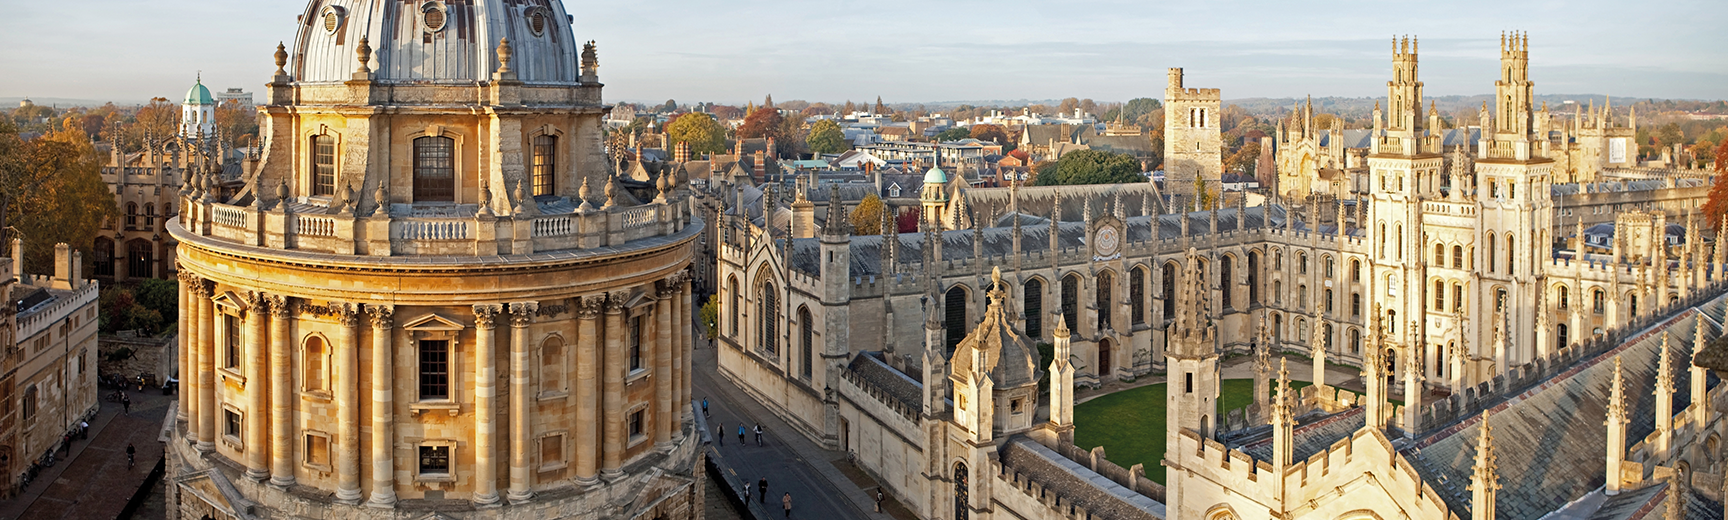 Radcliffe Camera Oxford skyline